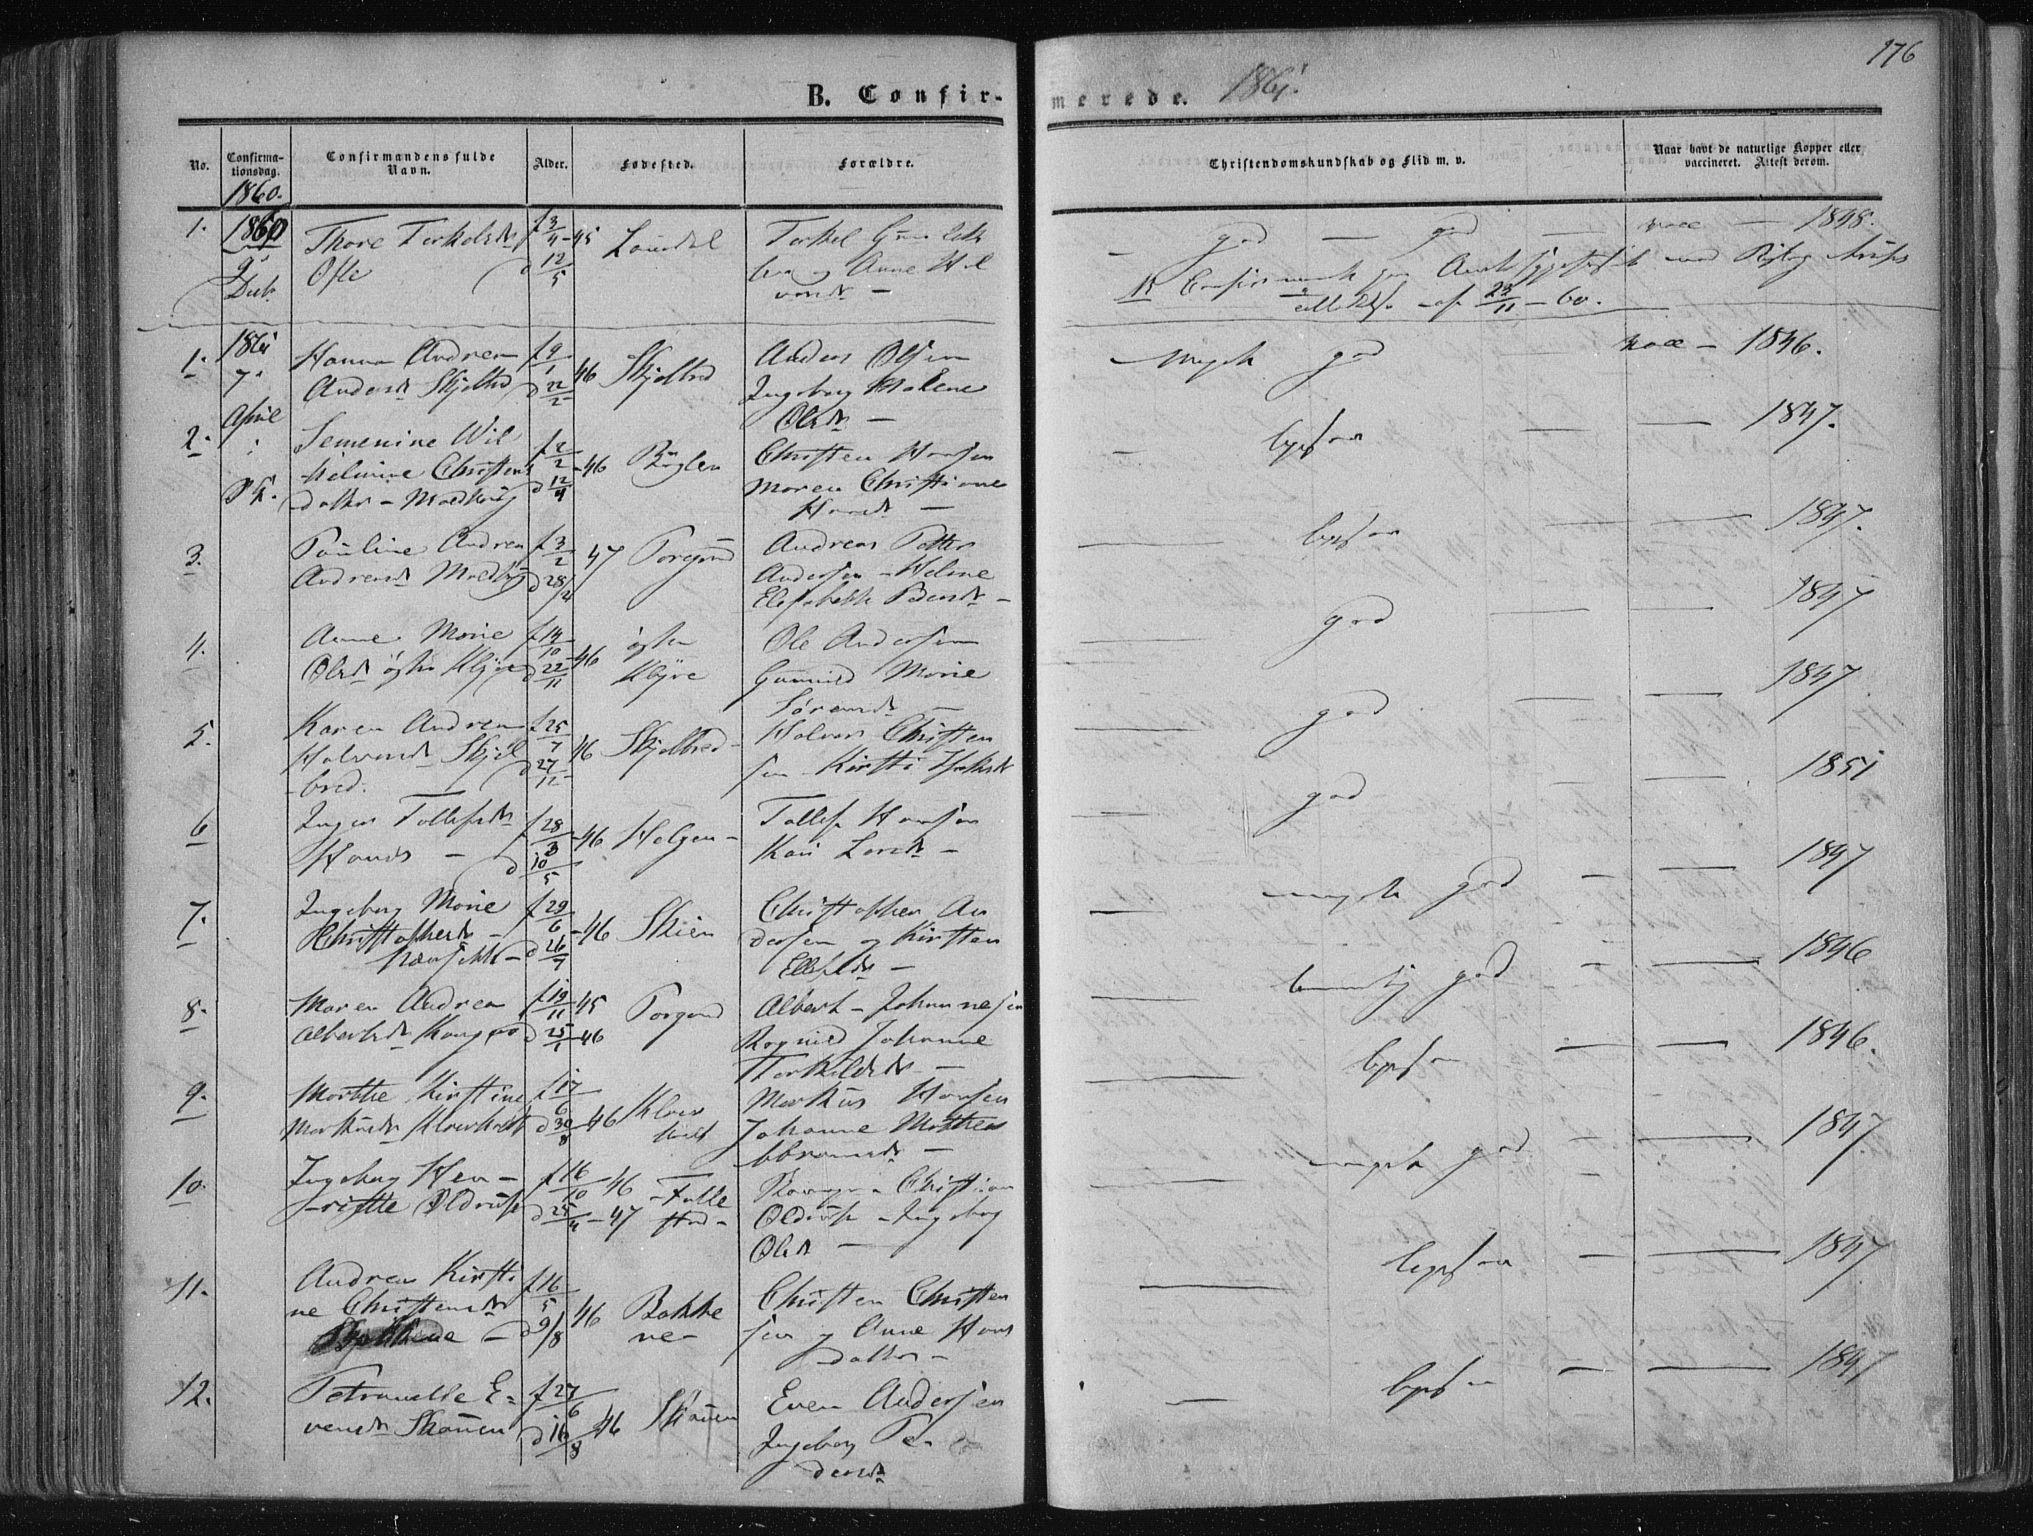 SAKO, Solum kirkebøker, F/Fa/L0007: Ministerialbok nr. I 7, 1856-1864, s. 176